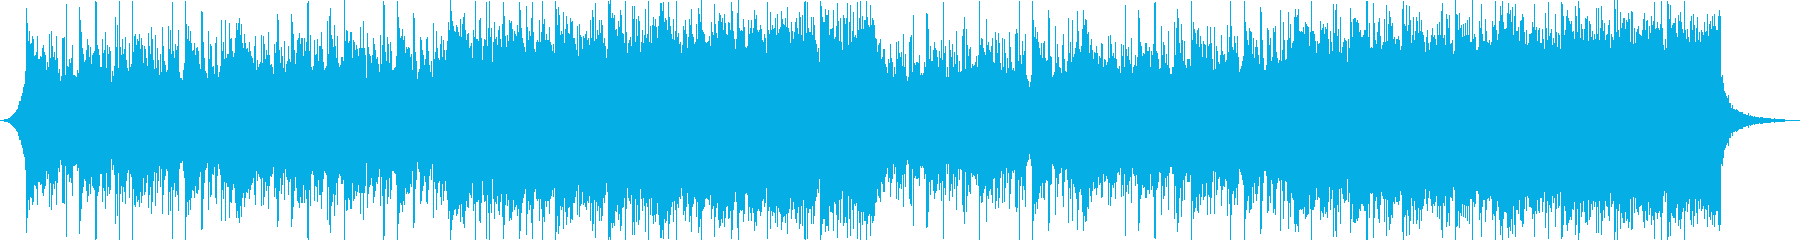 CM/先進的/革新的/オーケストラ/壮大の再生済みの波形